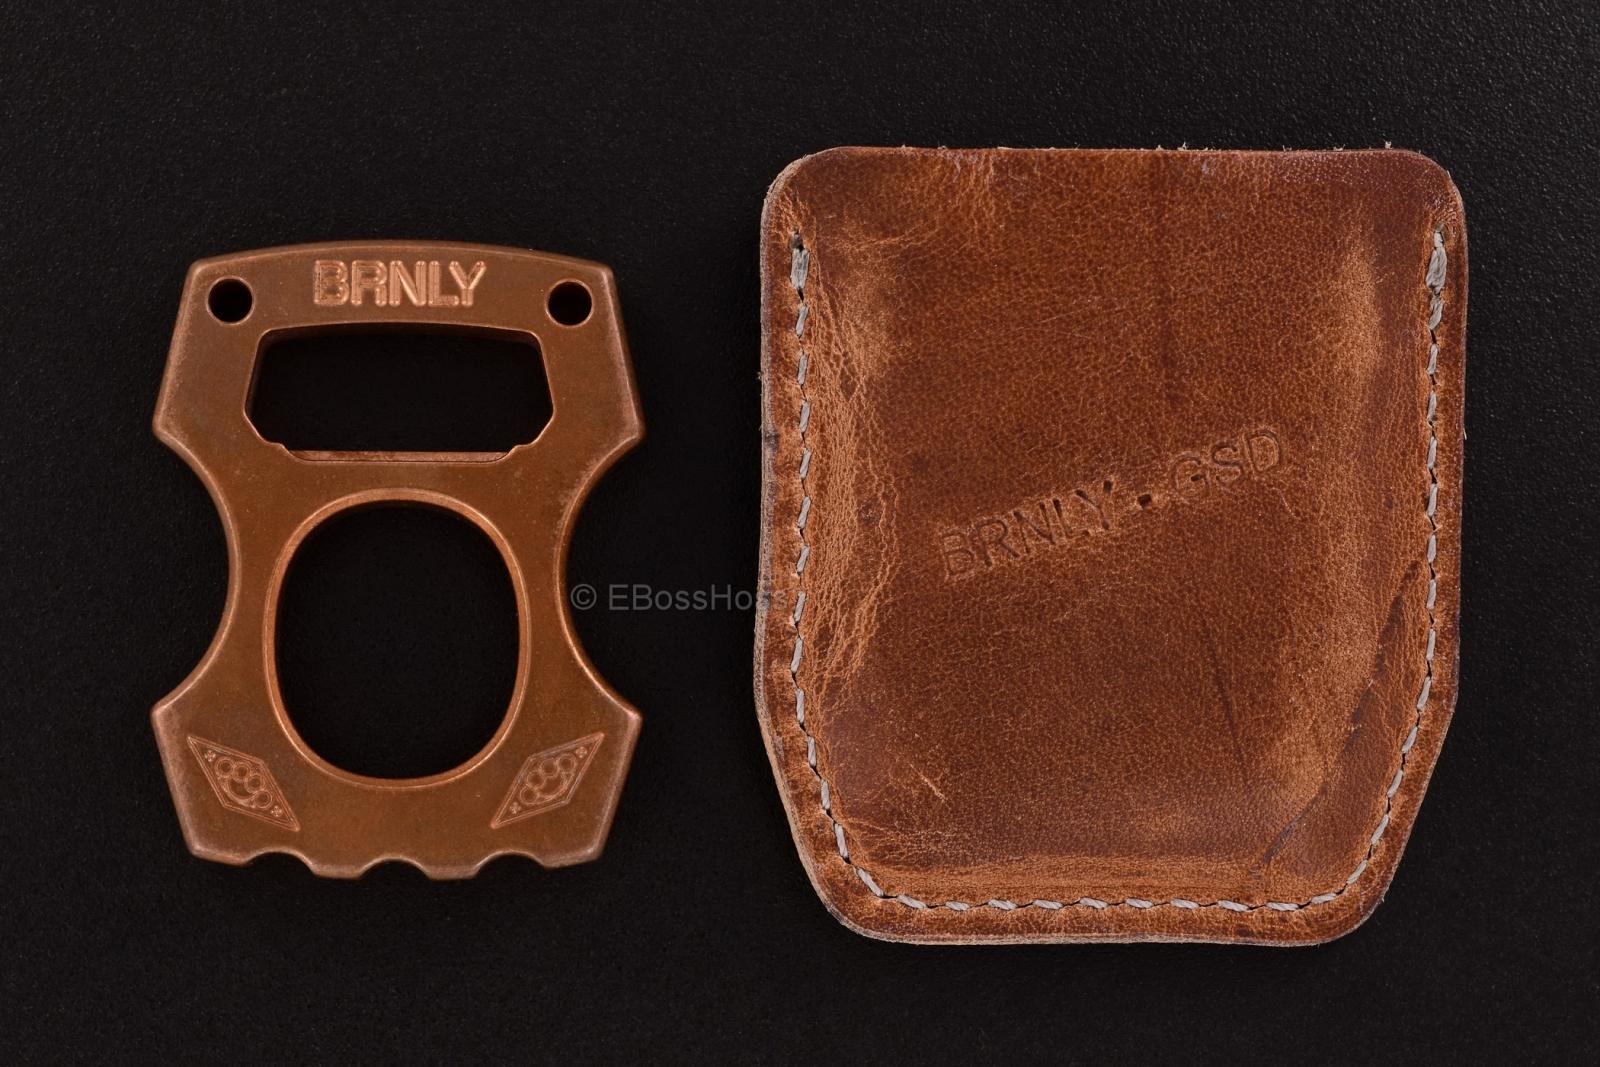 BRNLY Brawler Copper Toothy CYPOP - by Lucas Burnley